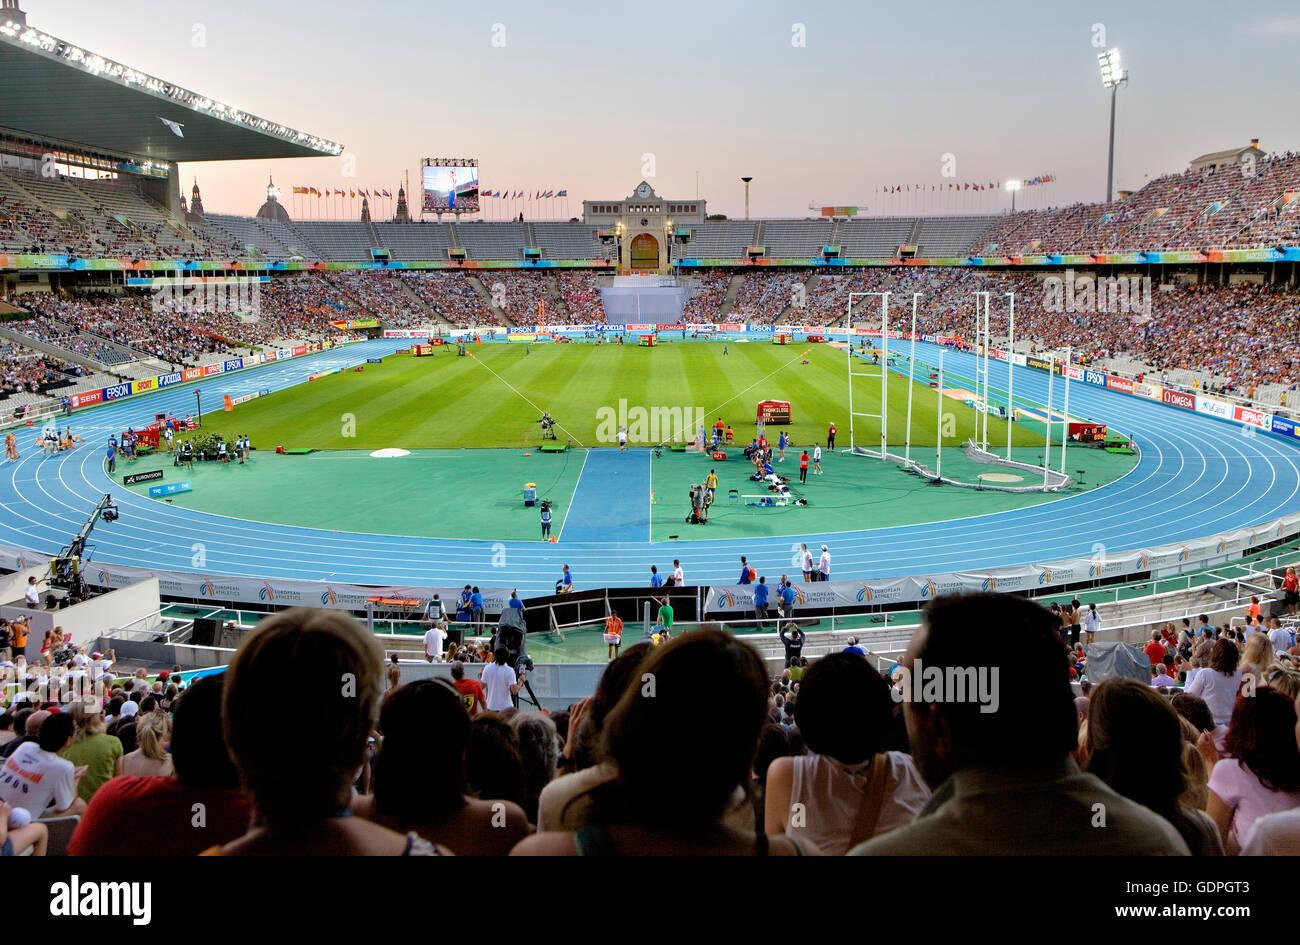 Olympic stadium (Estadi Olímpic Lluís Companys) Montjuic, Barcelona, Spain, Europe - Stock Image